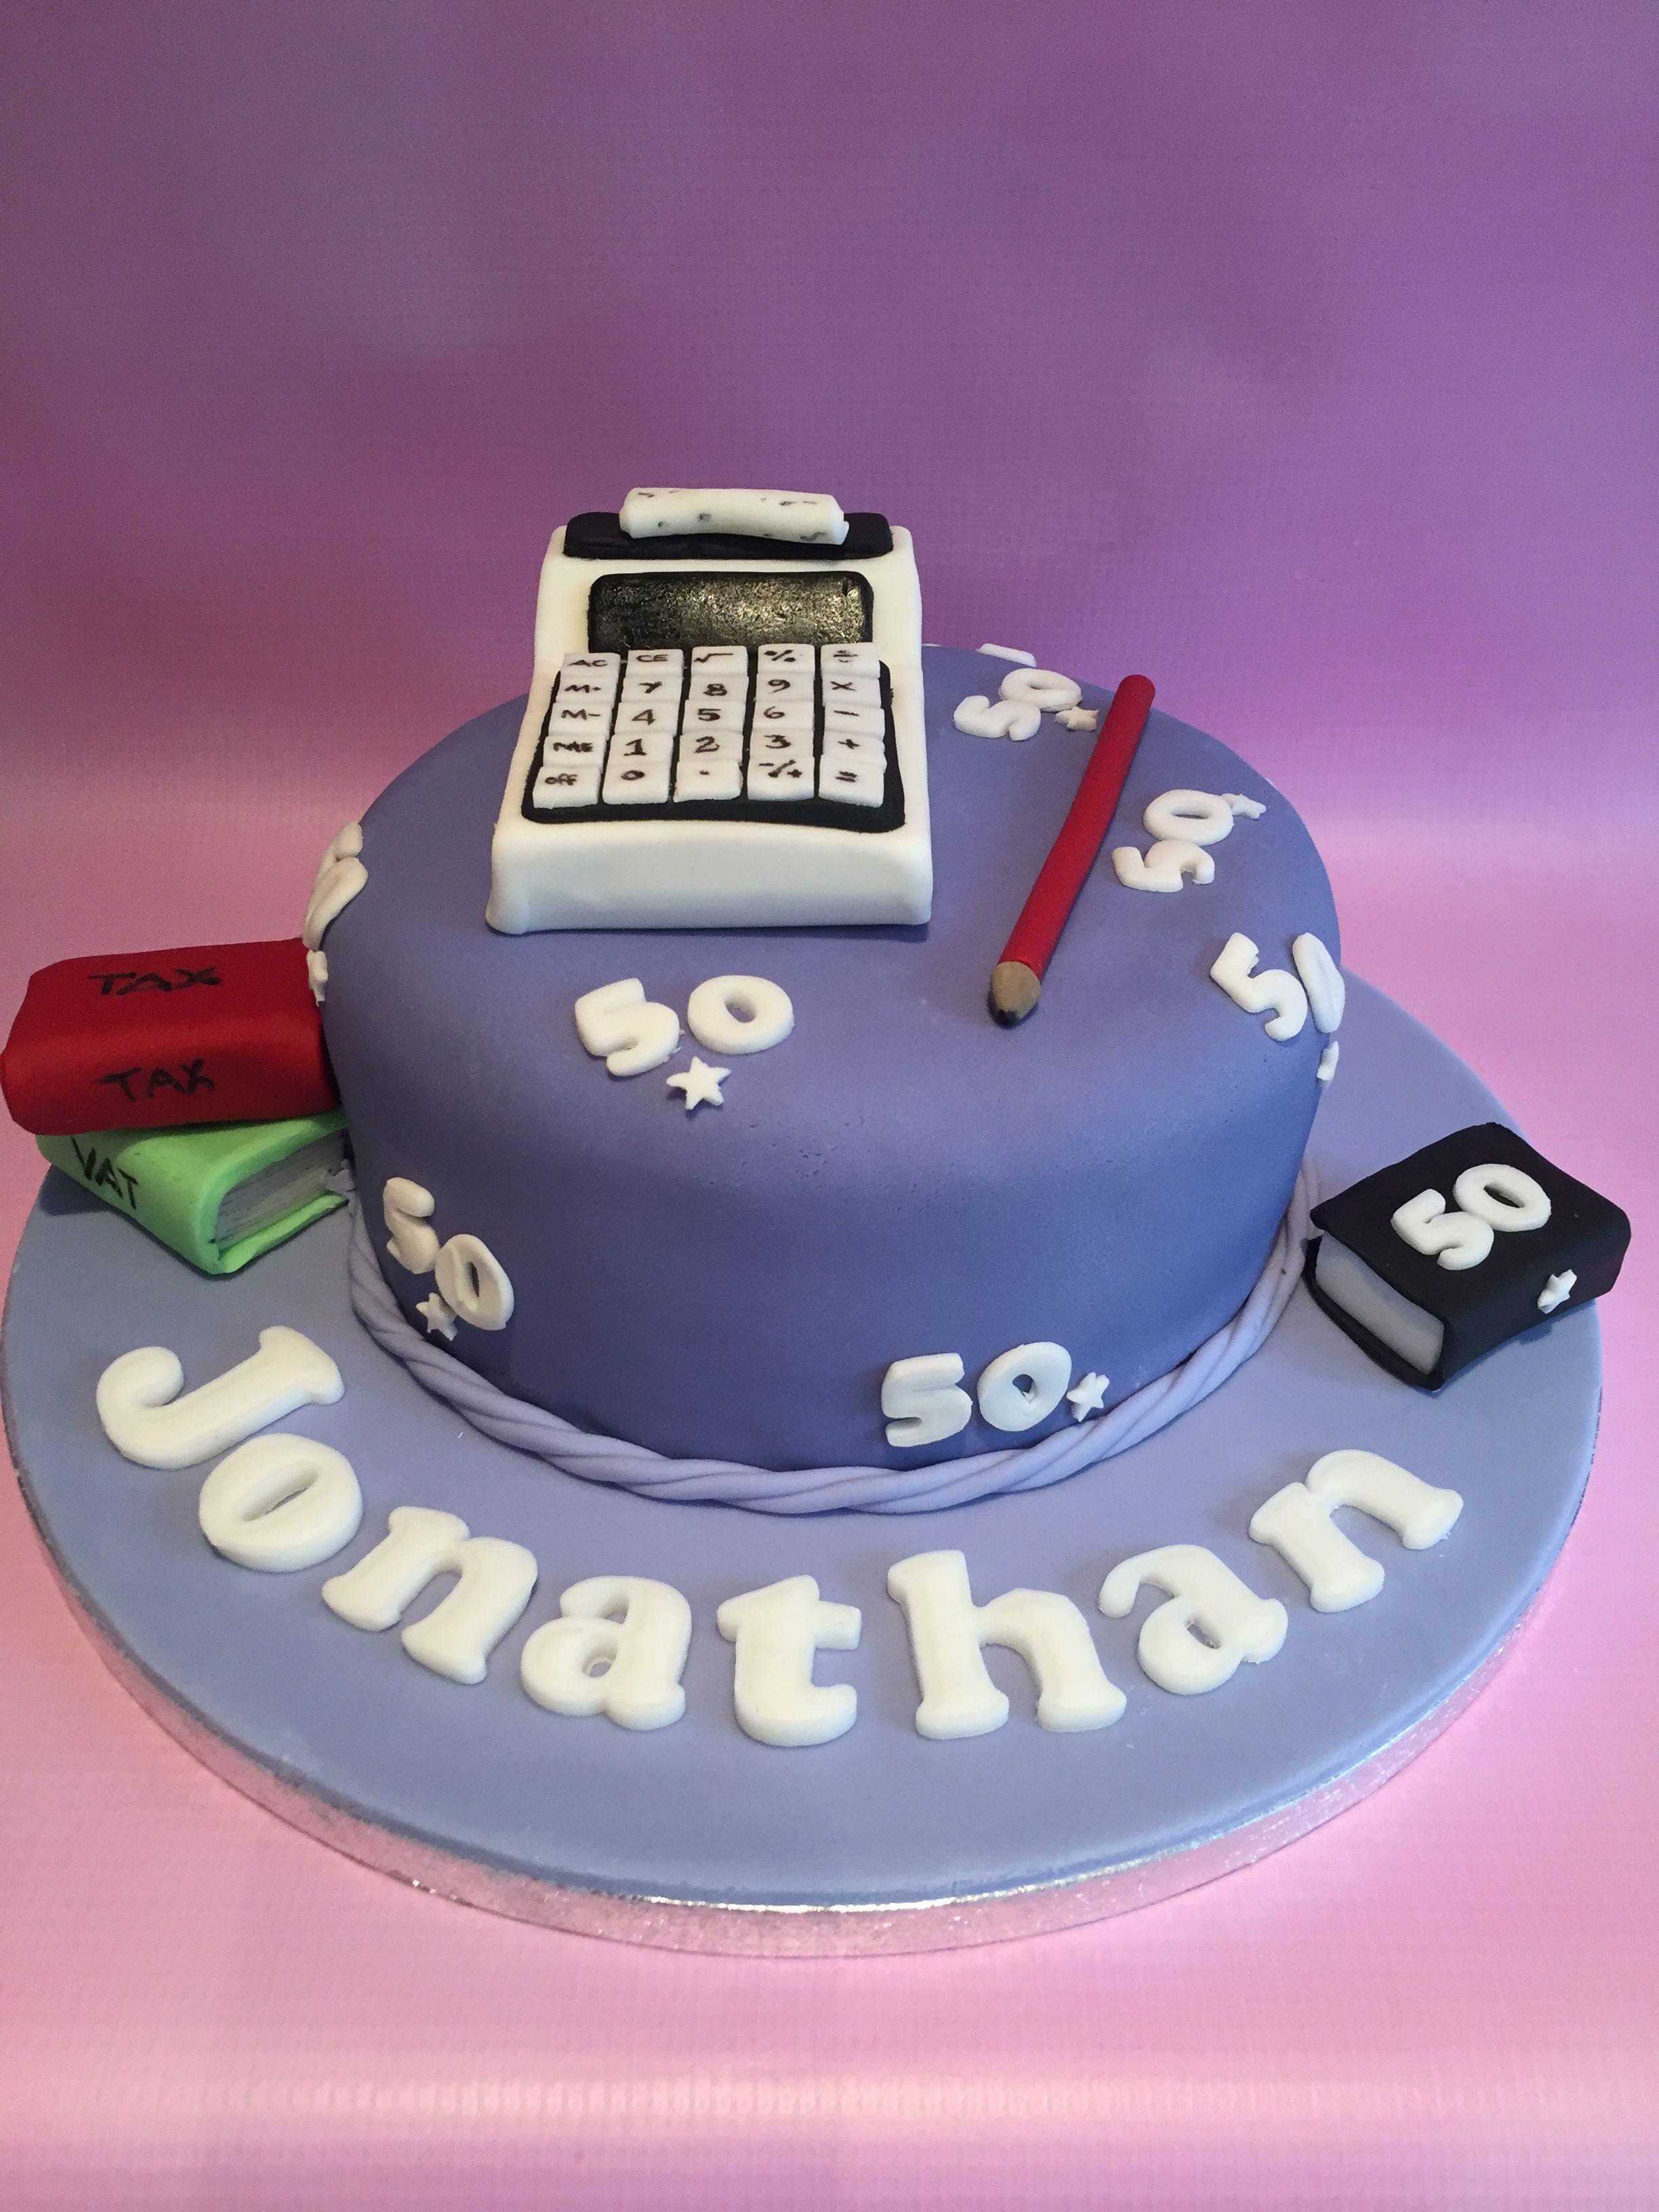 Strange Accountant Cake Cake Cake Design Desserts Personalised Birthday Cards Akebfashionlily Jamesorg